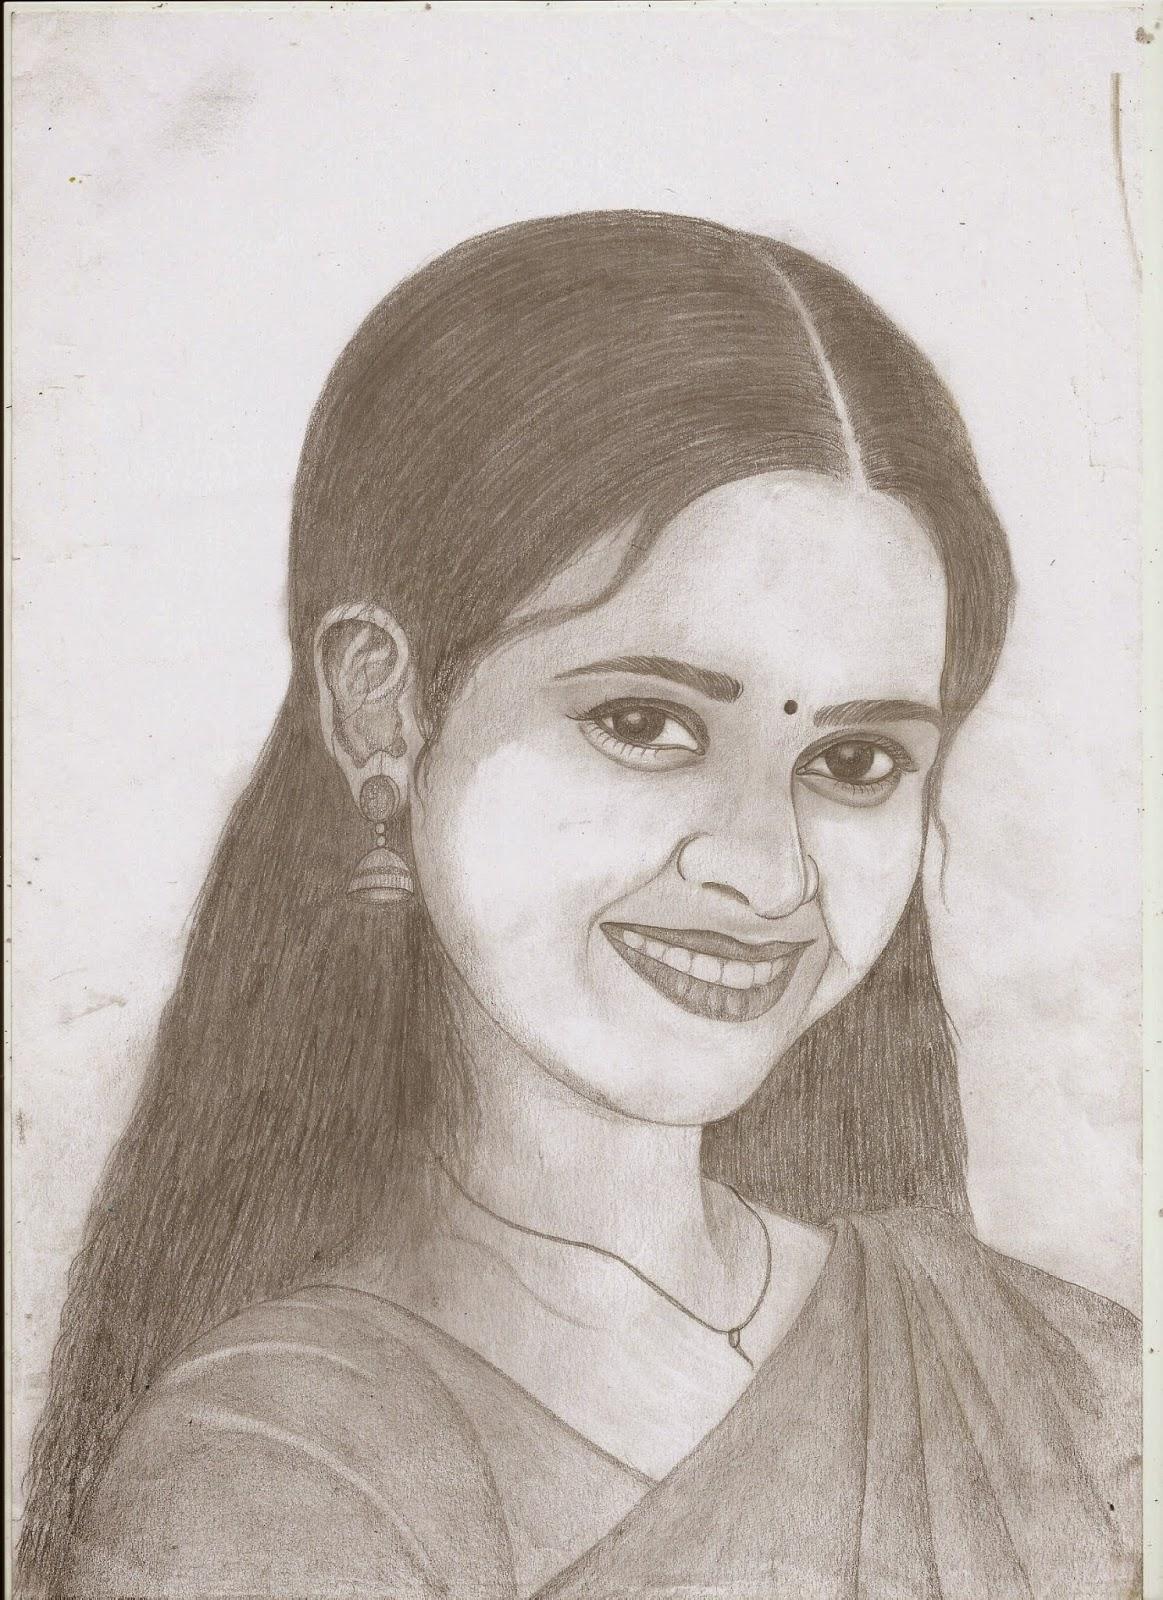 Sri divya pencil sketch actress sri divya